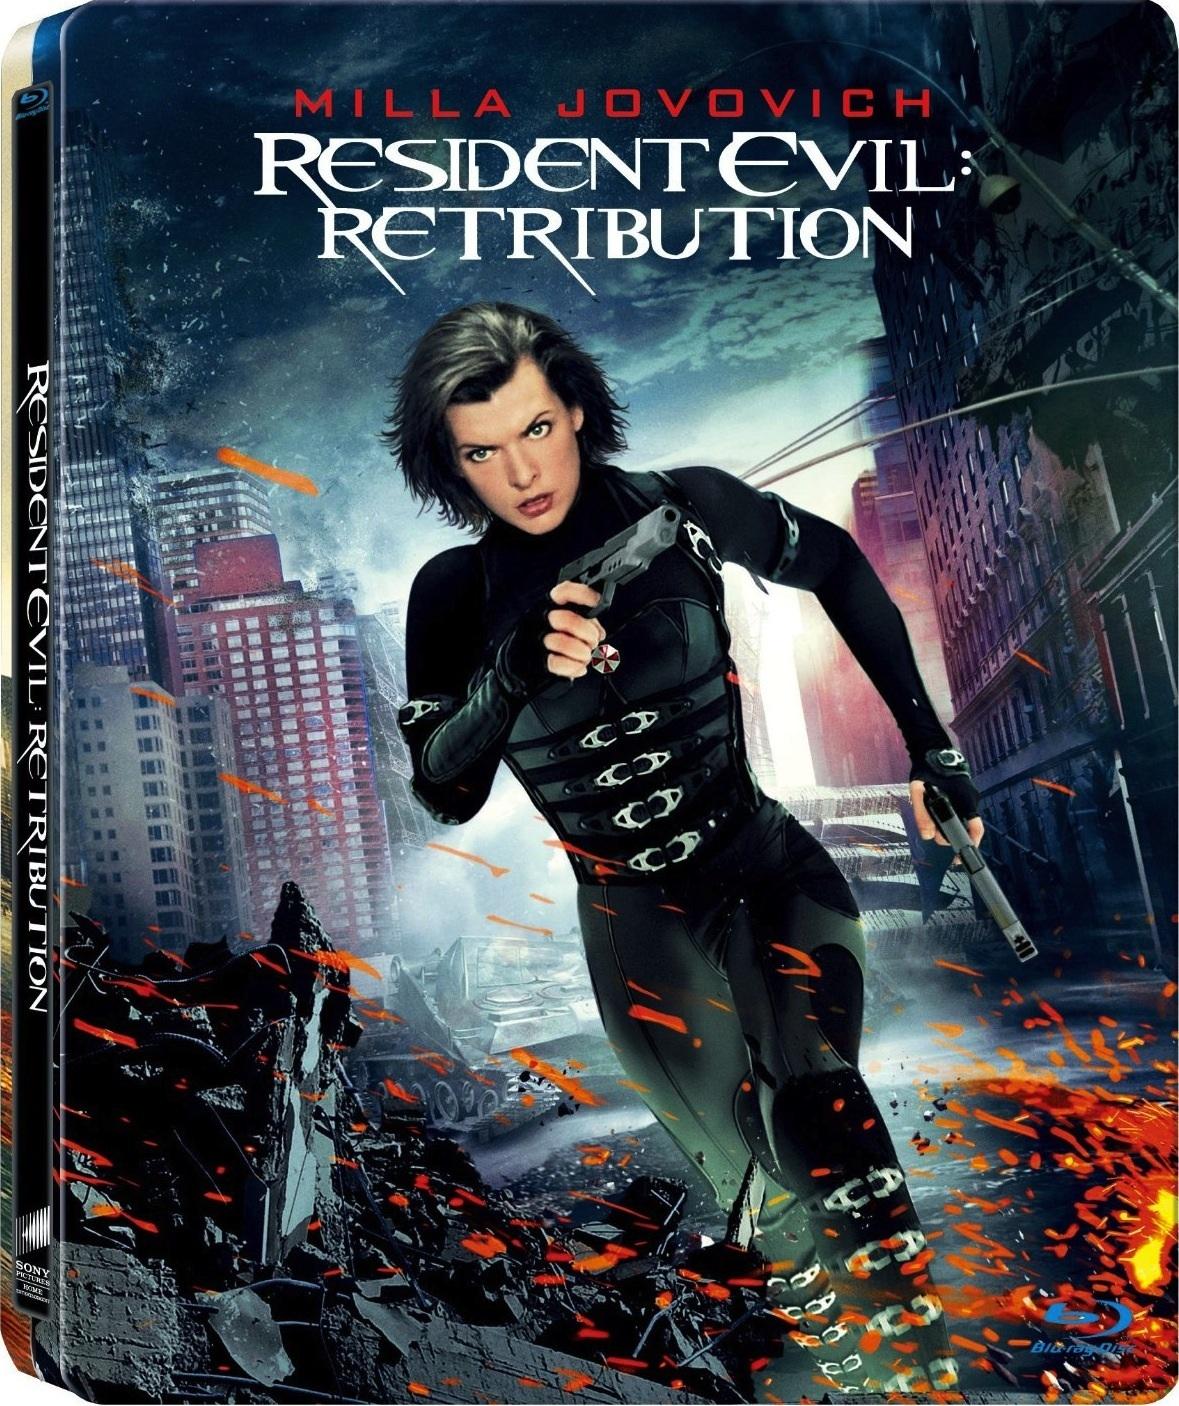 filme resident evil 5 retribuio dublado rmvb